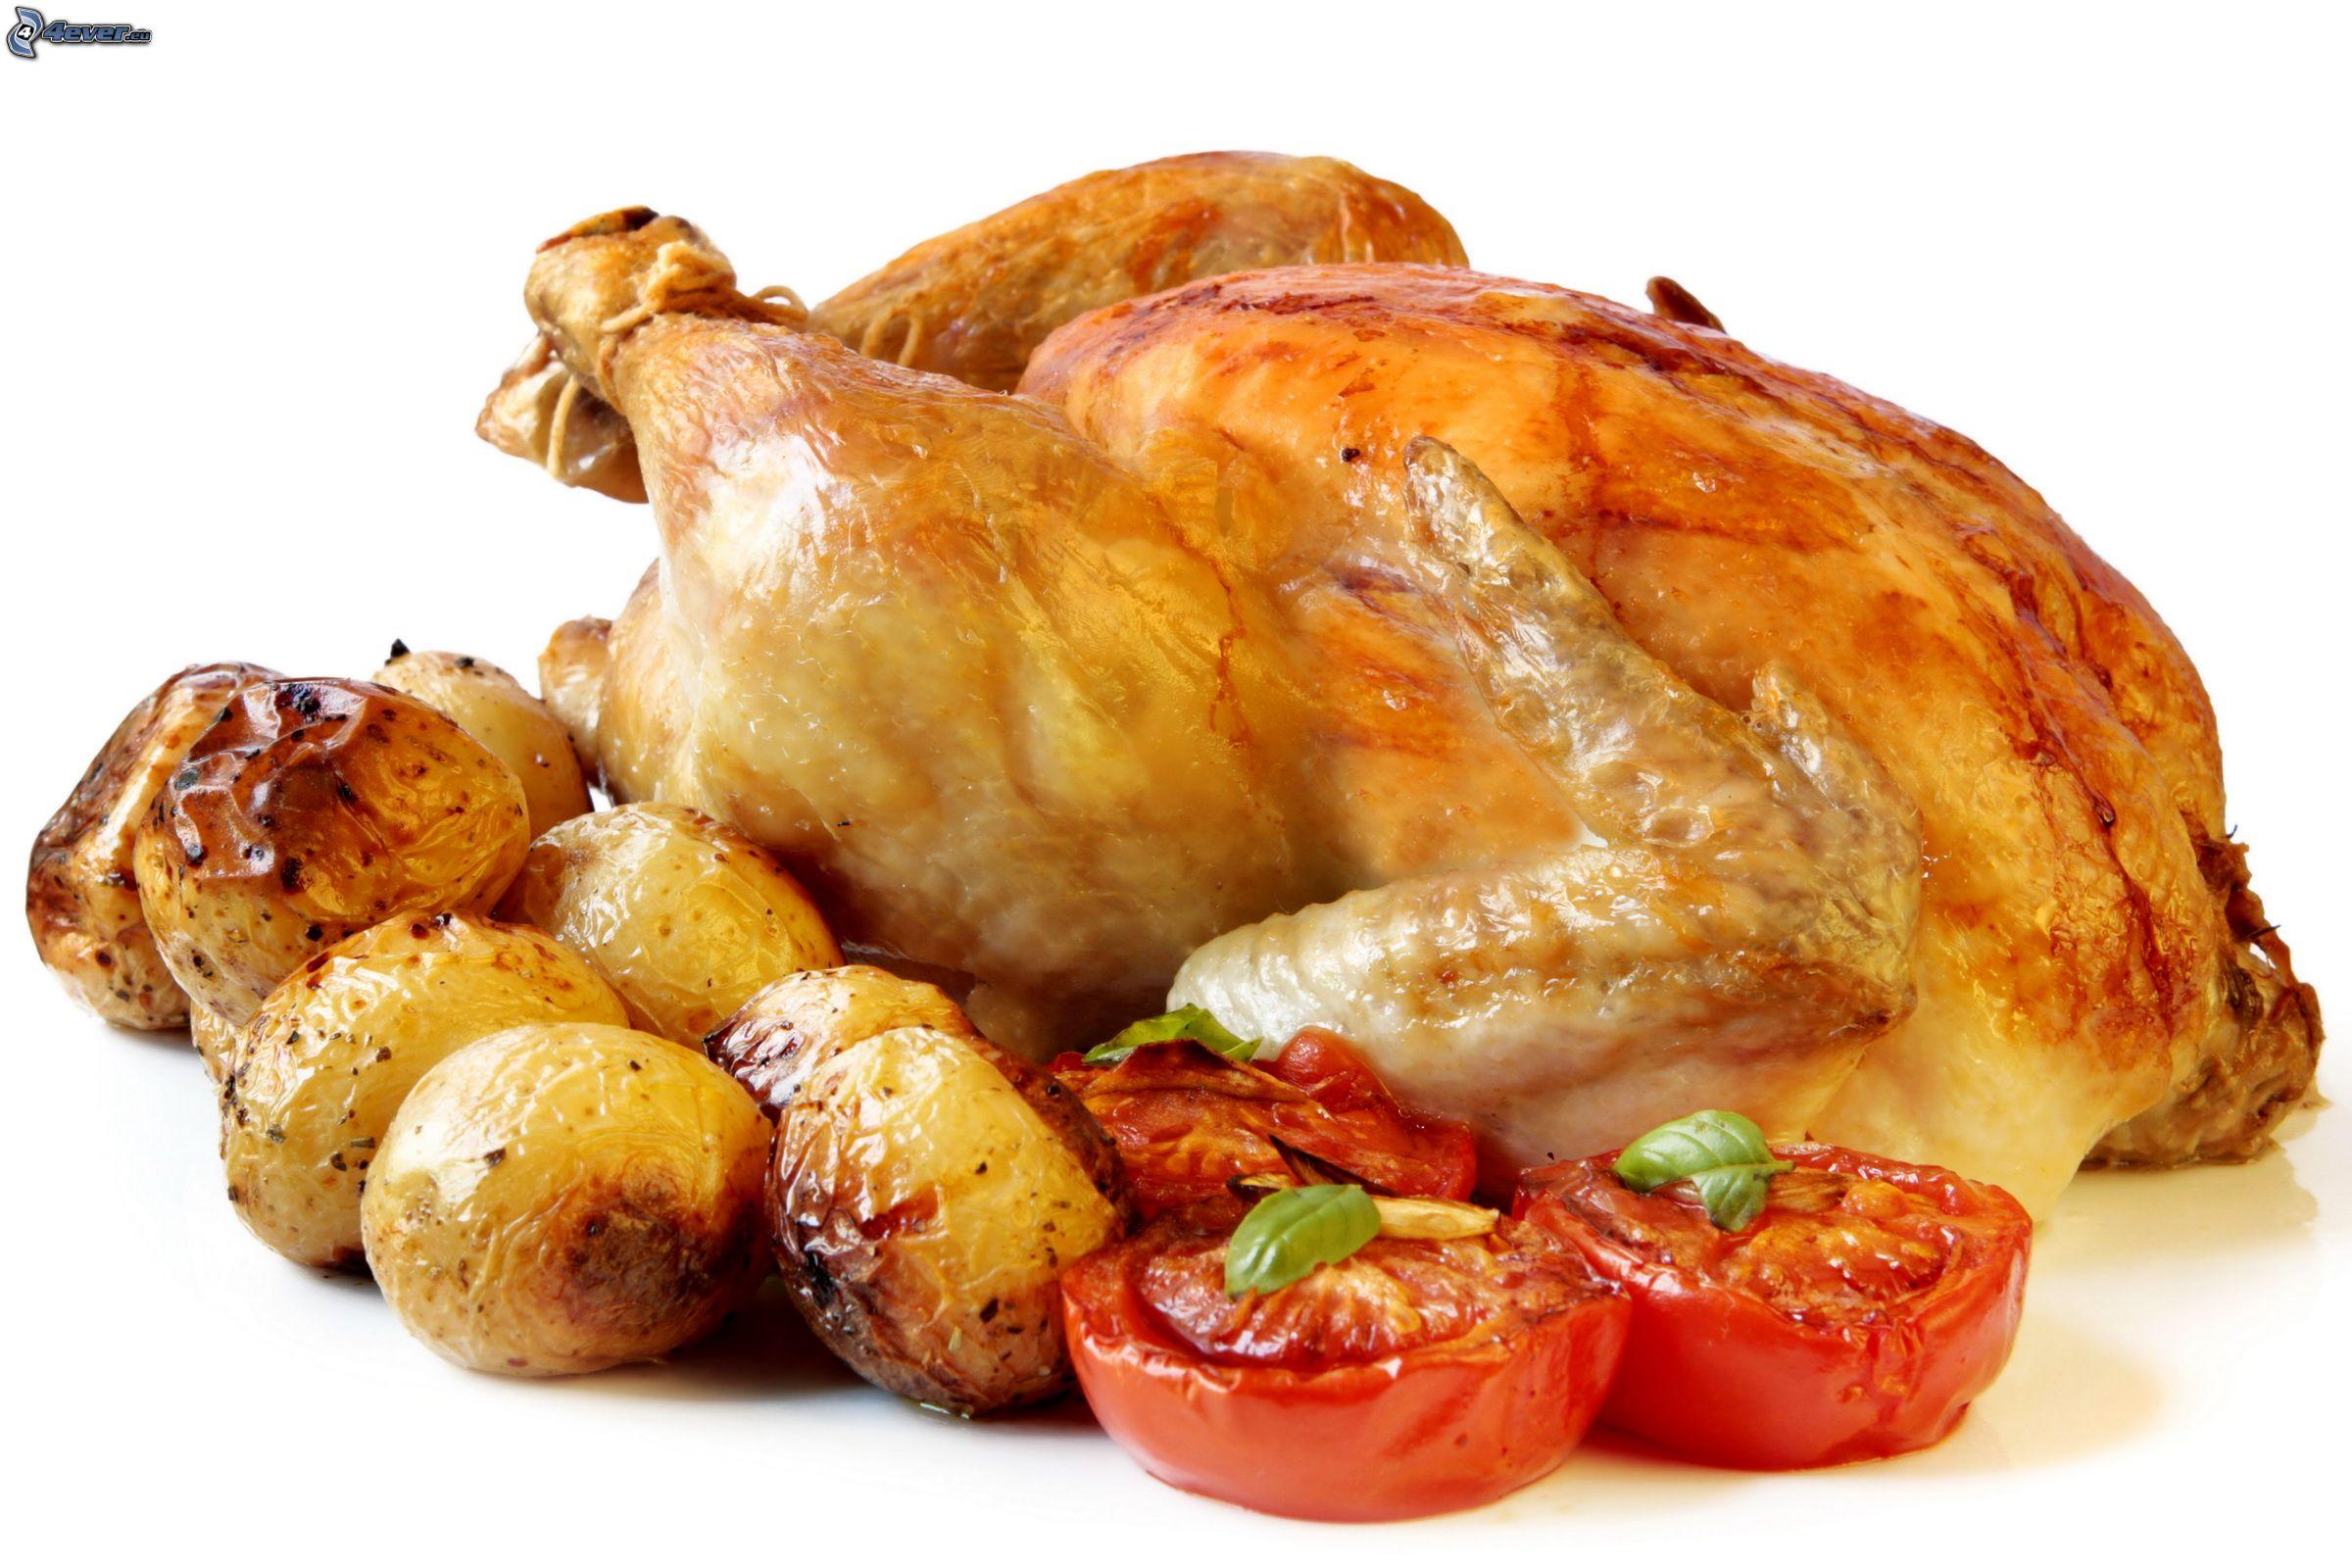 Poulet r ti - Dessin de poulet roti ...